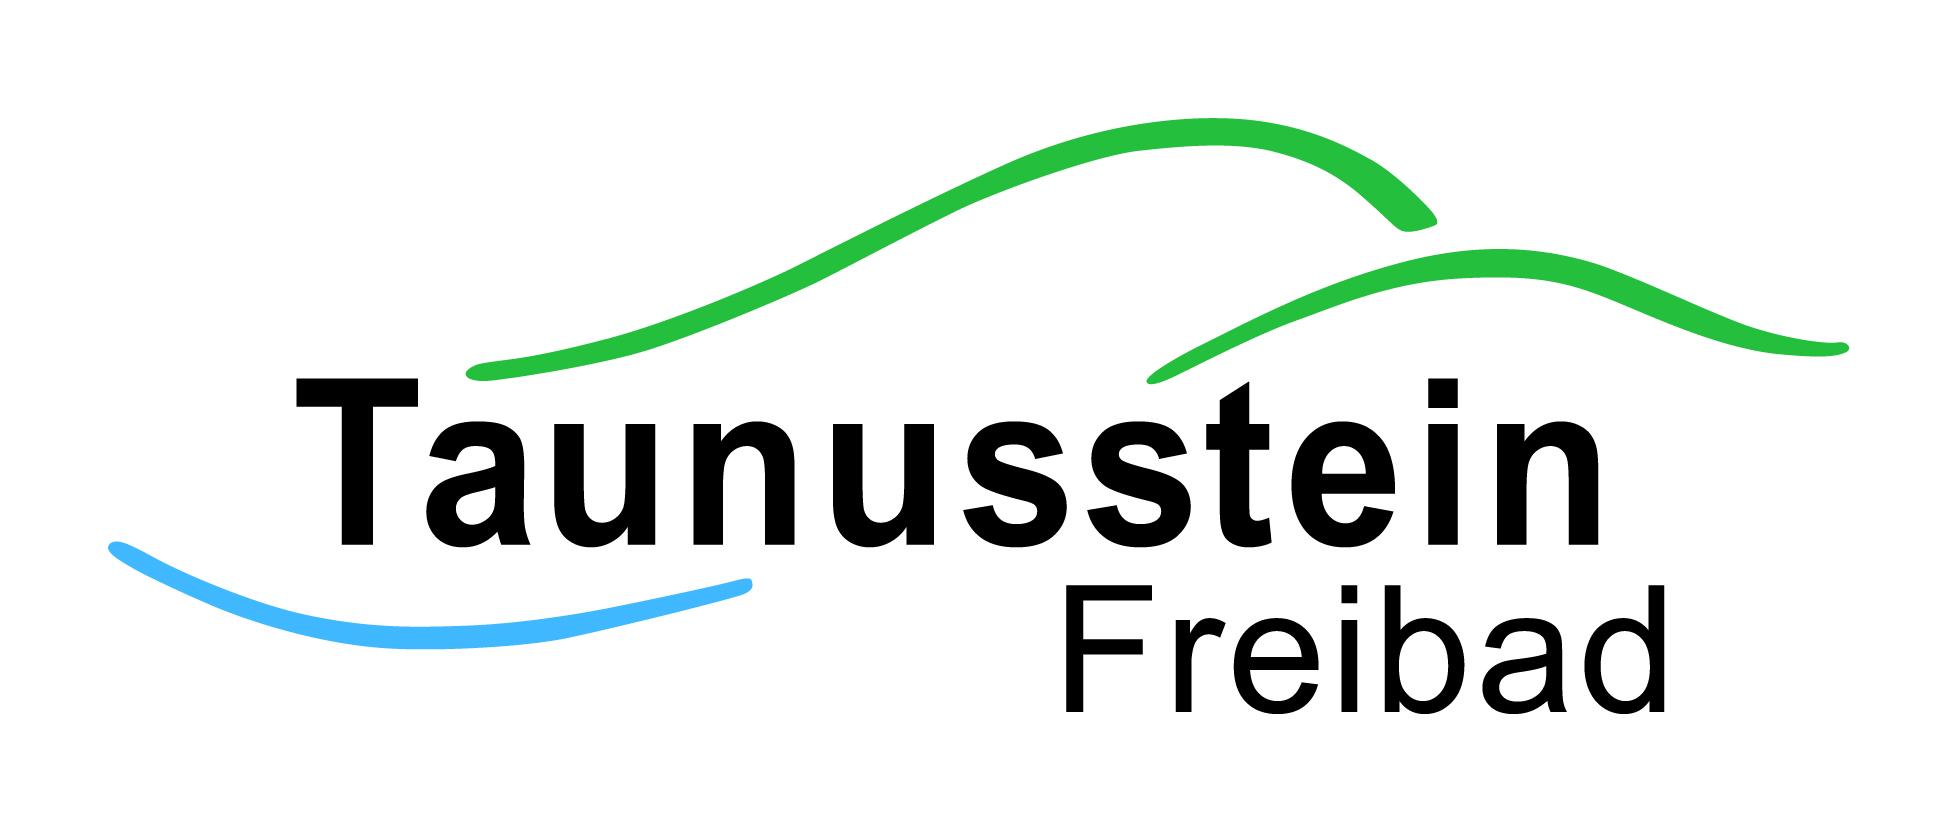 Freibad Taunusstein